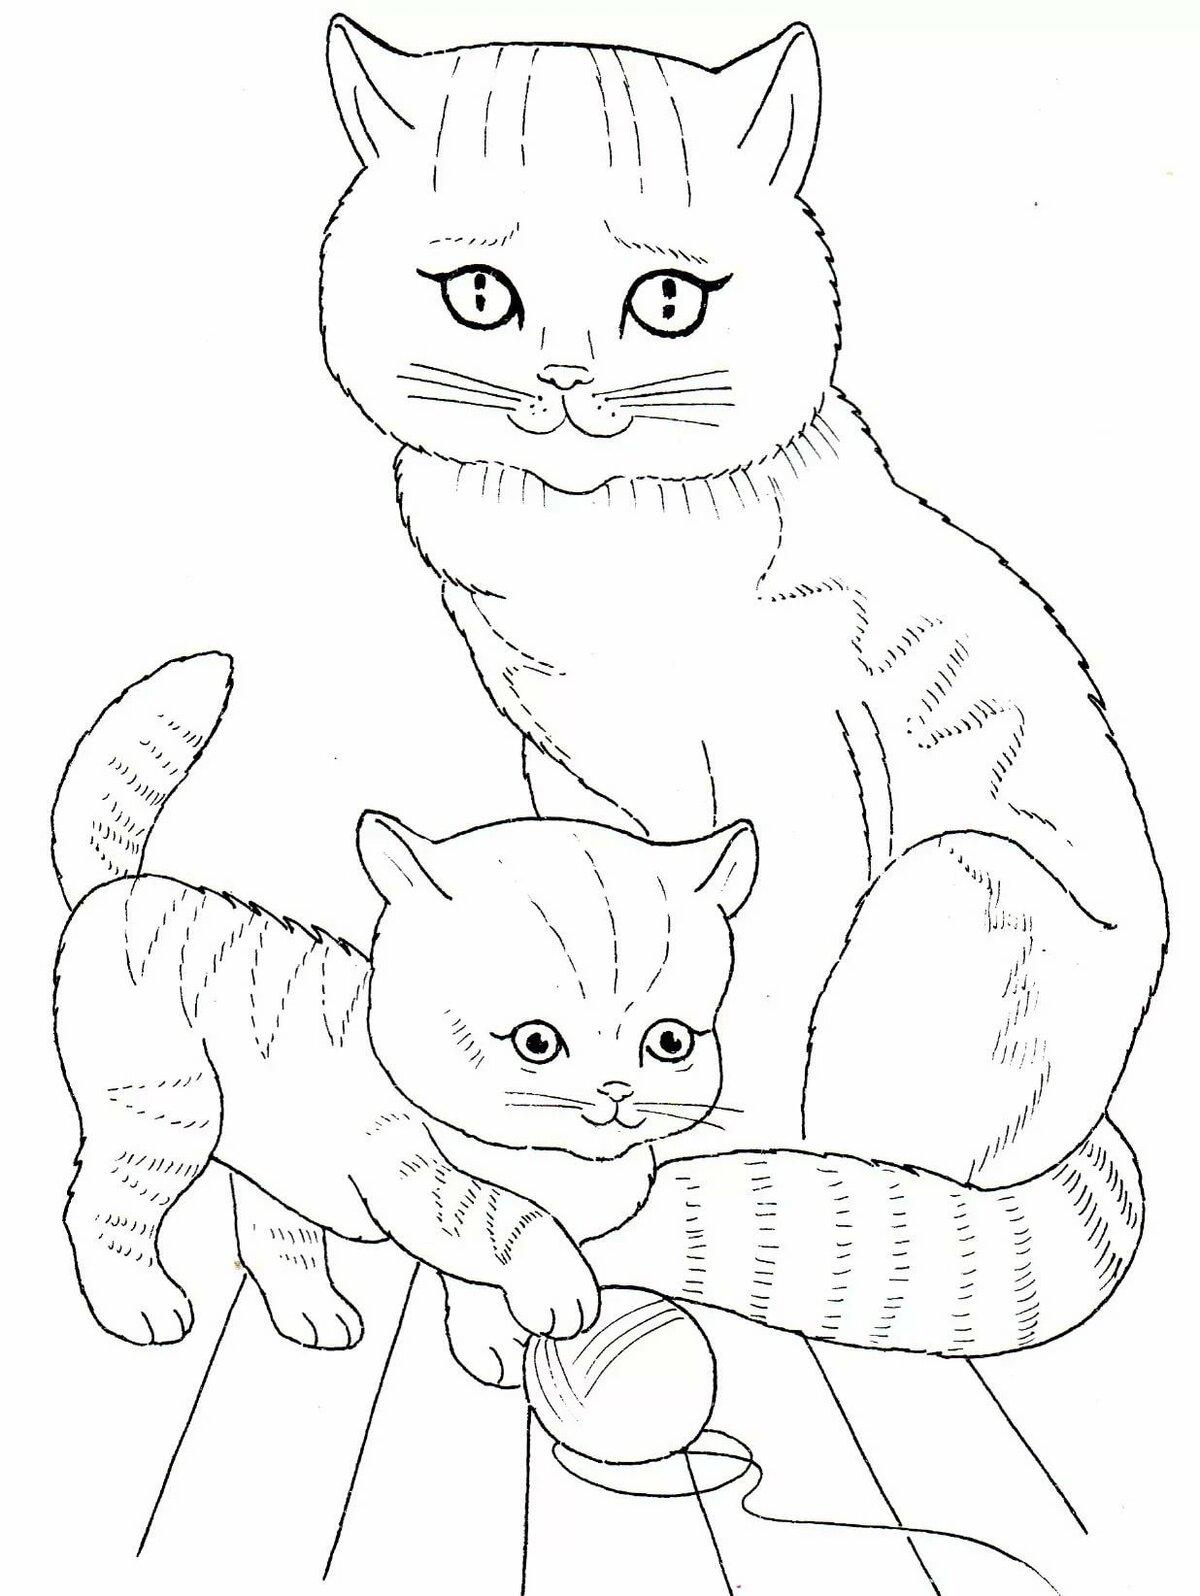 Картинки кошки и котята для срисовки, внимание гифка литература